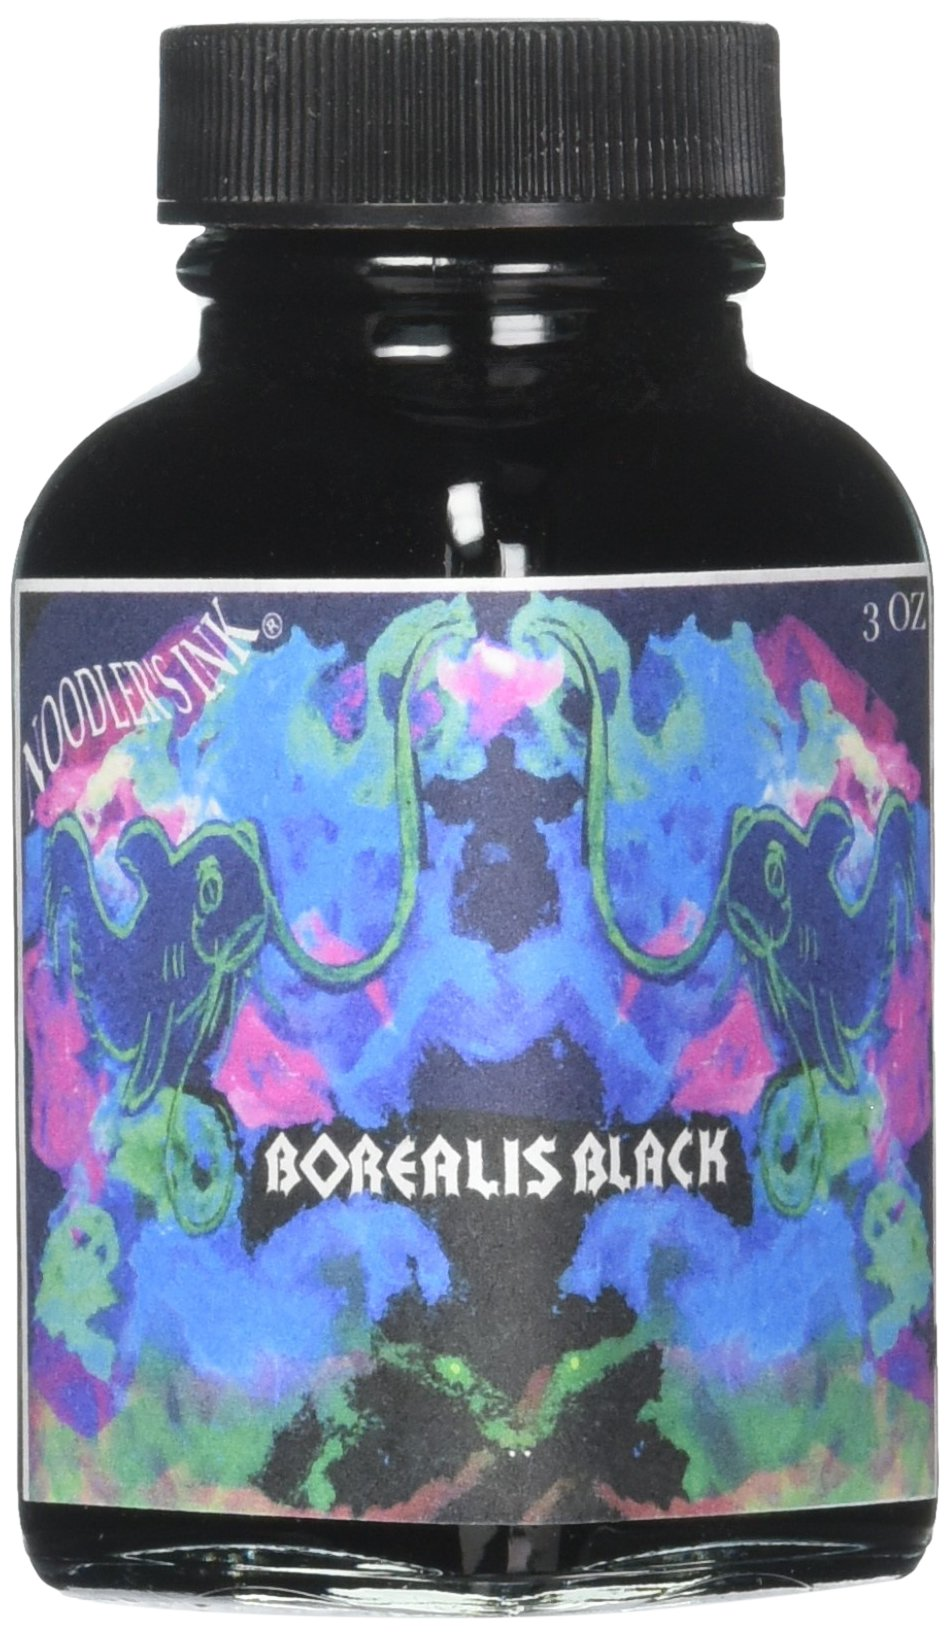 Noodlers Ink 3 Oz Borealis Black